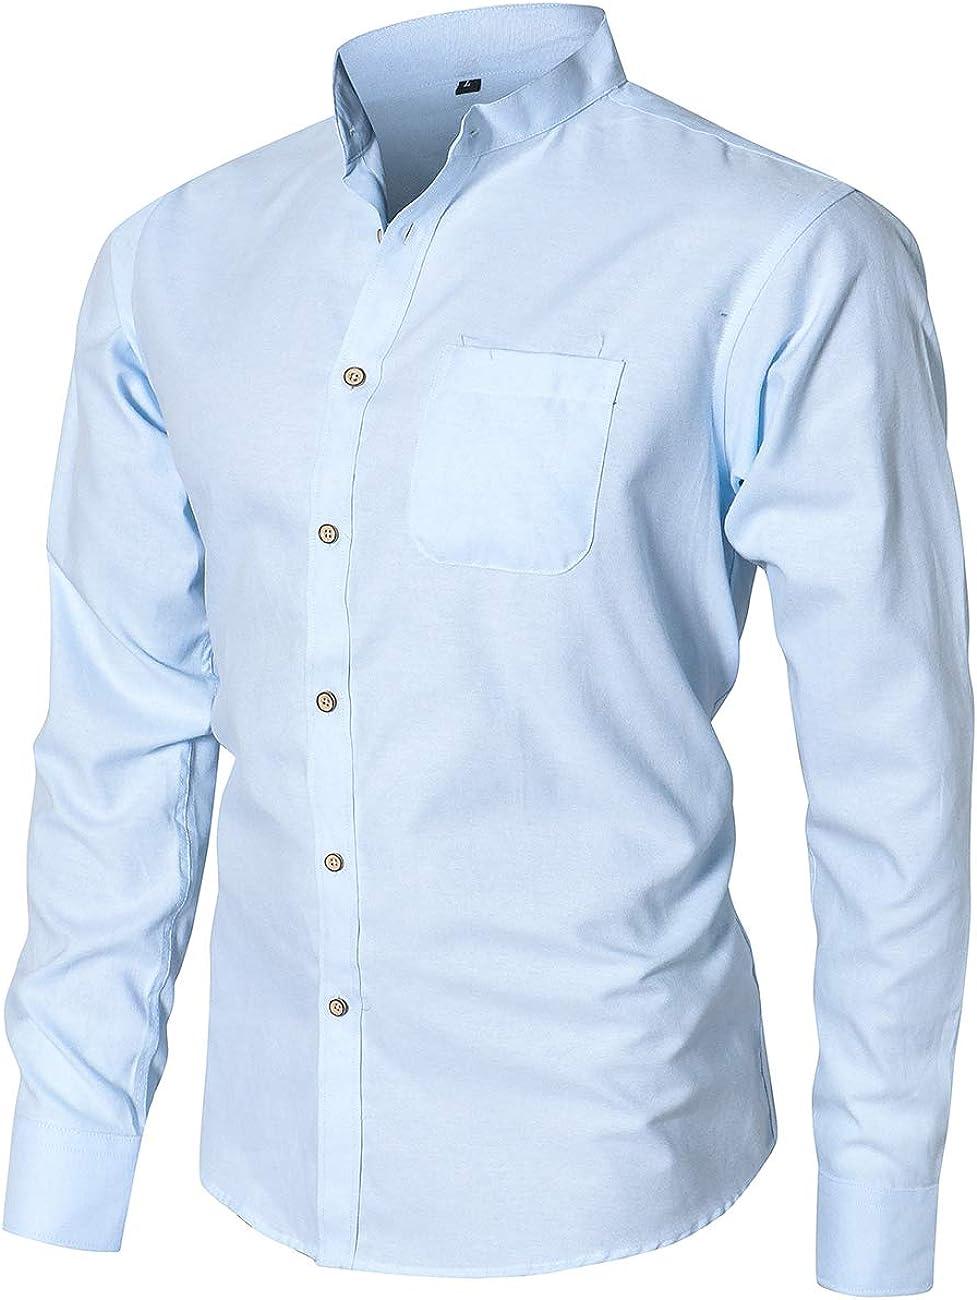 Dioufond Banded Collar Shirts Cotton Oxford Mandarin Collar Shirts for Men